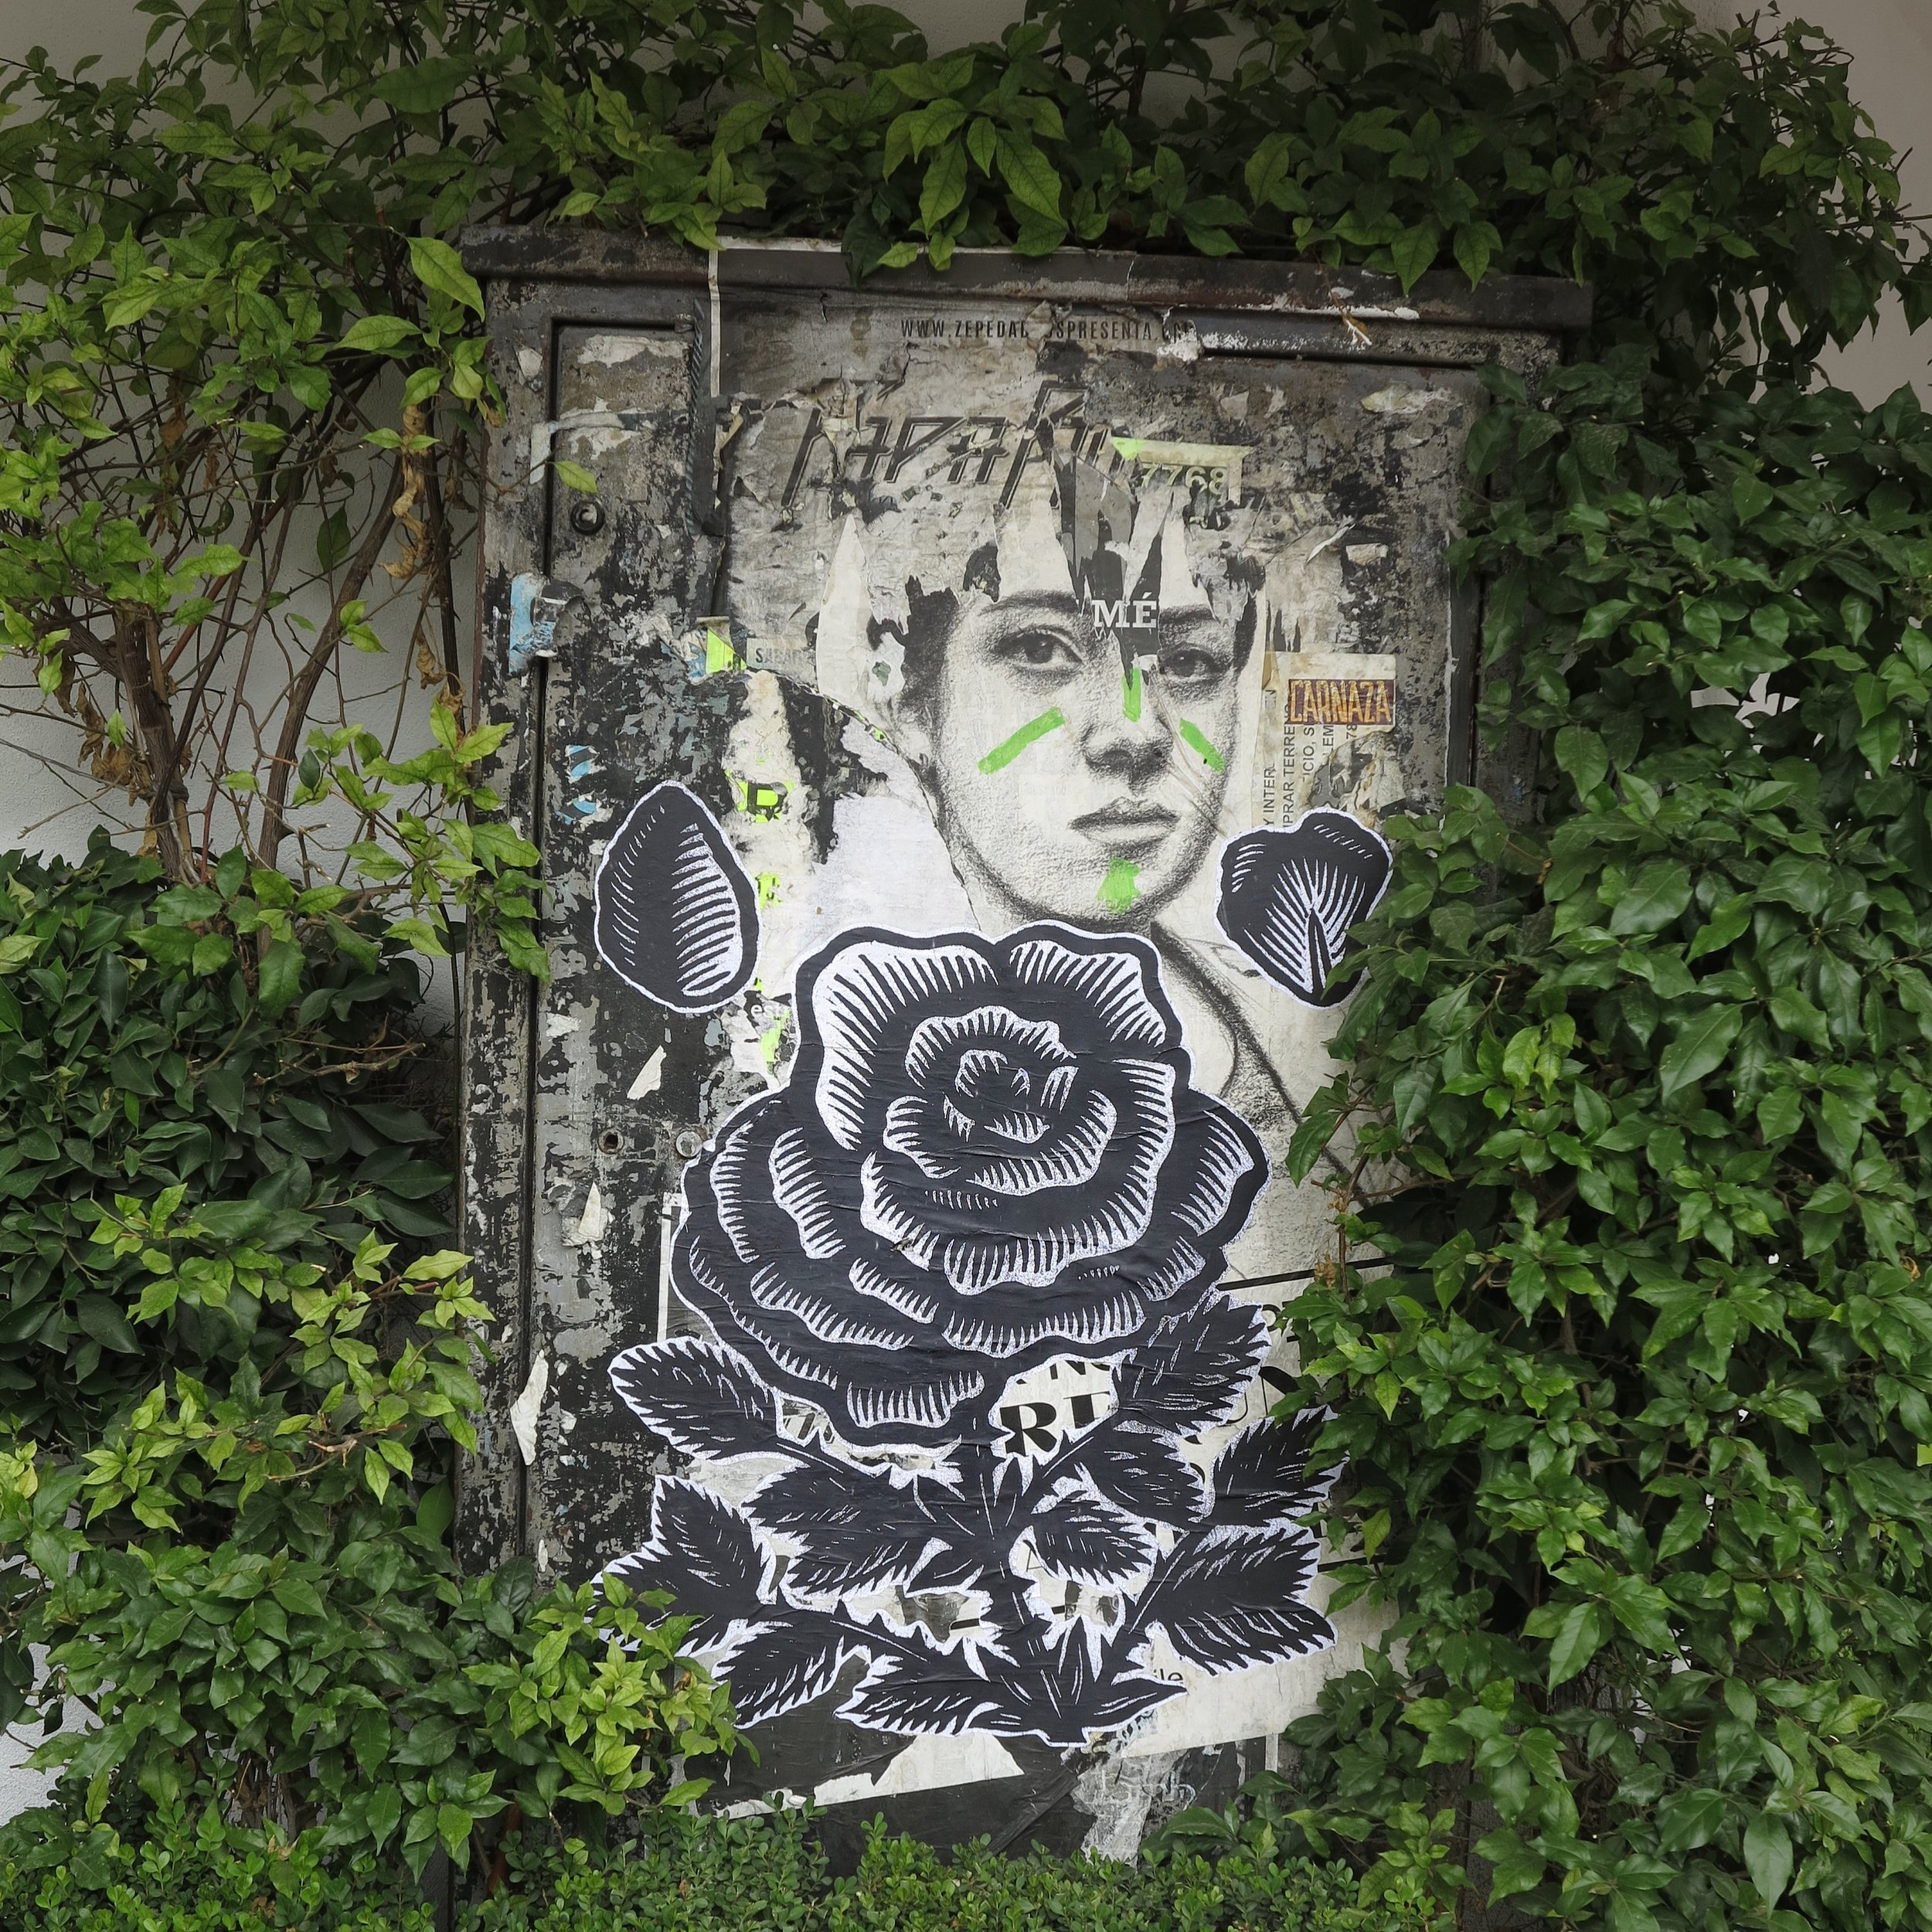 K. Choy,  Rosa  pasteup: Mexico City, DF, Photo Credit: K. Choy